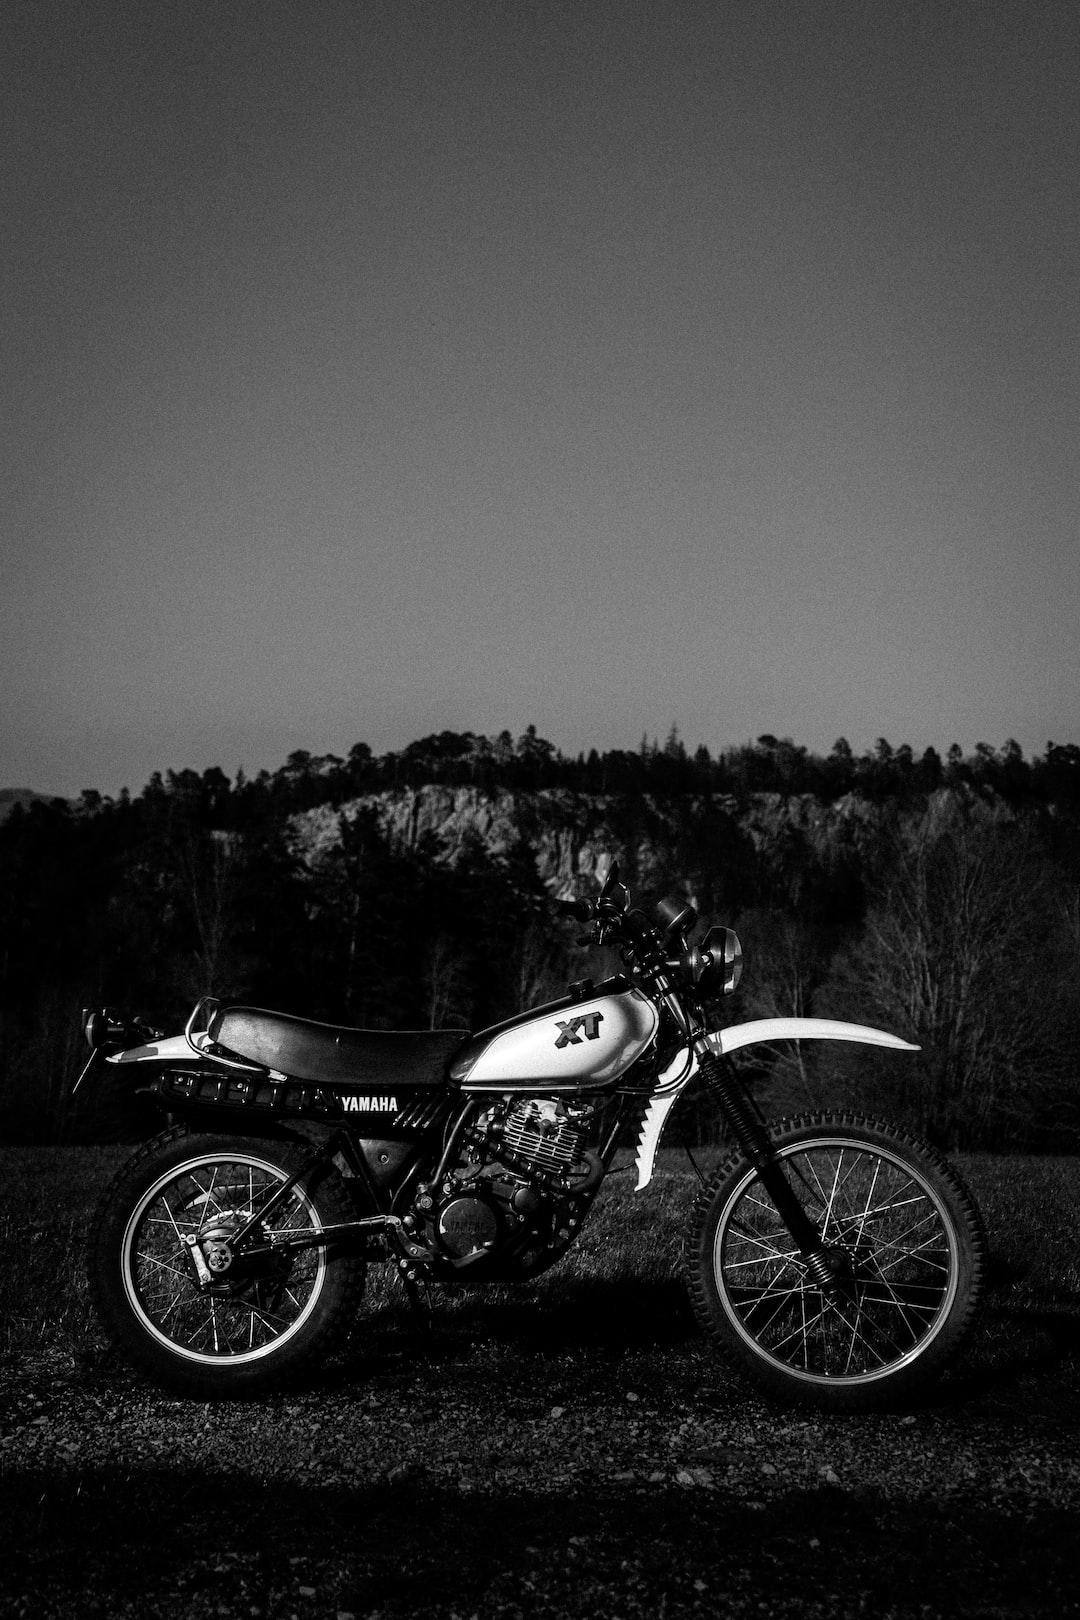 Old school bike - Yamaha XT 250 restored